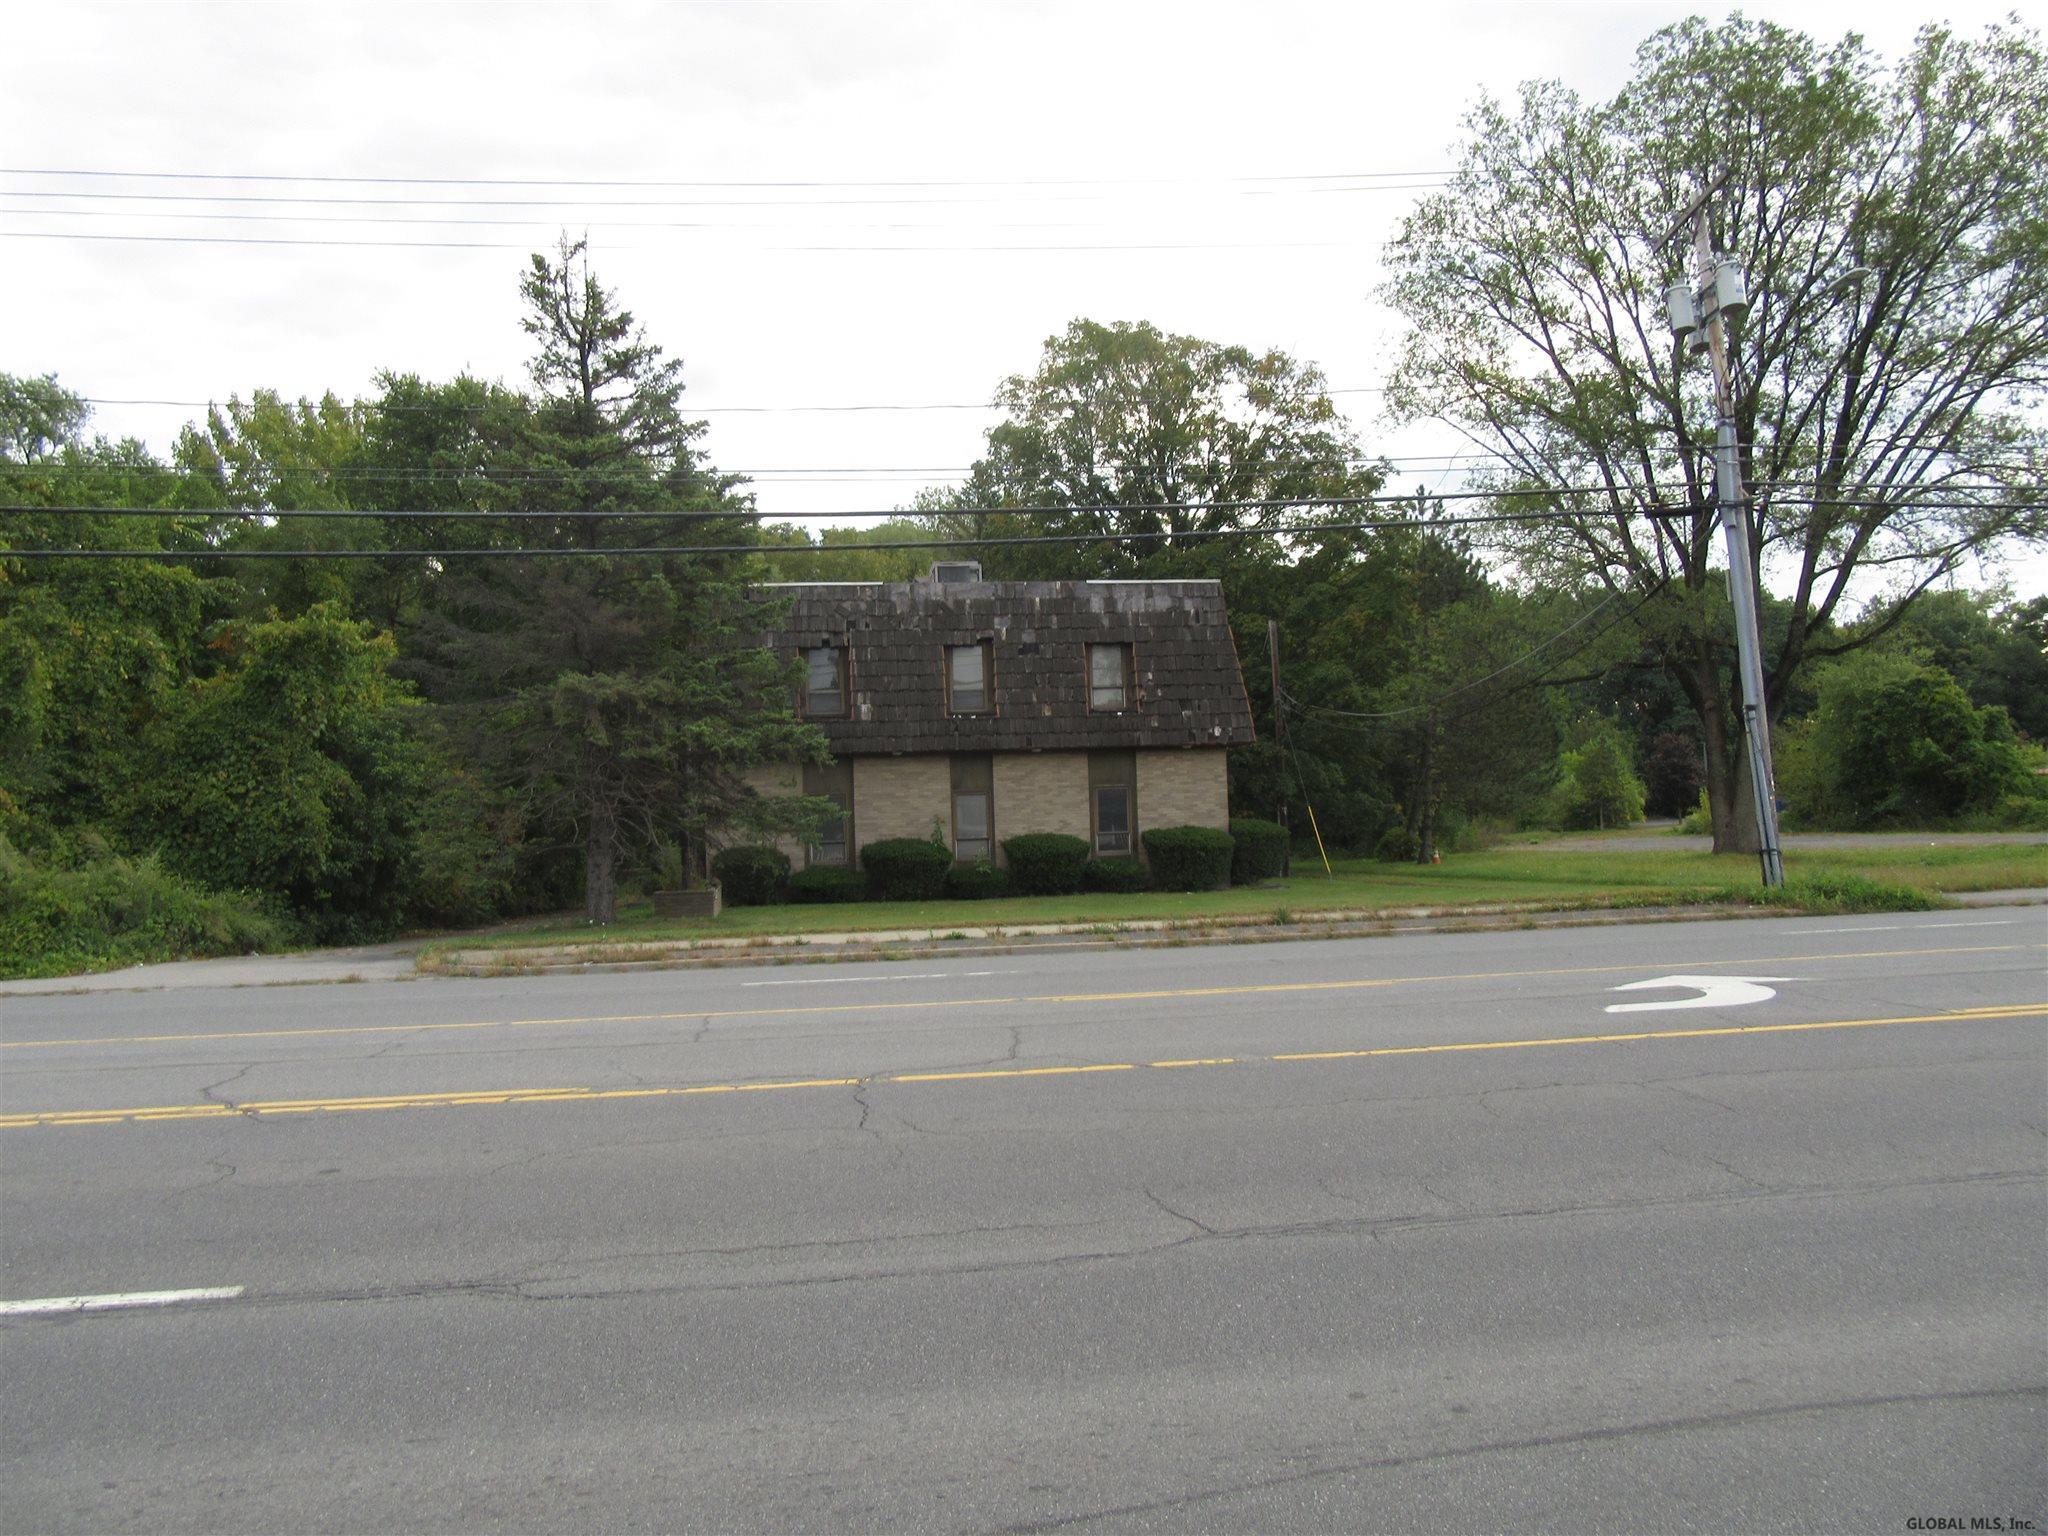 Albany image 2